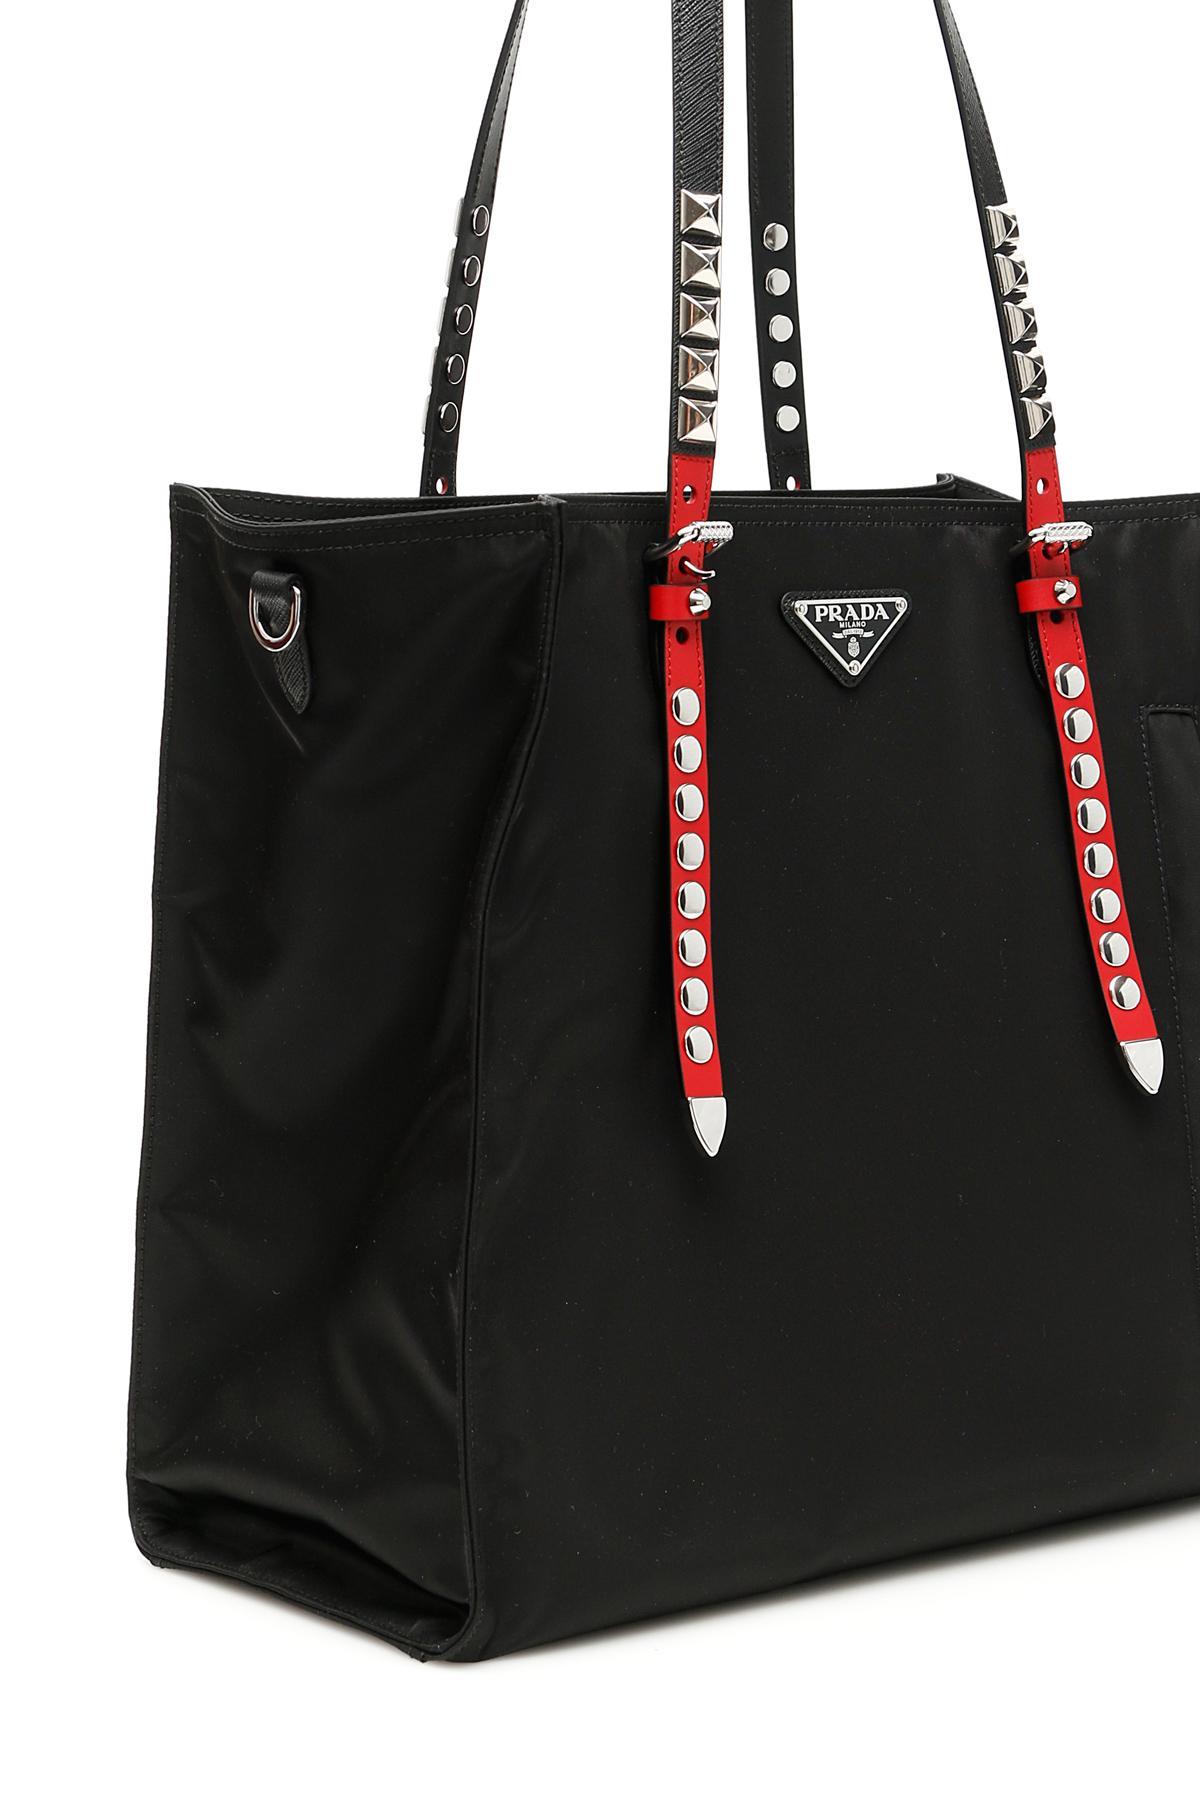 e9630859e00f Prada Studded Nylon Shopper in Black - Lyst